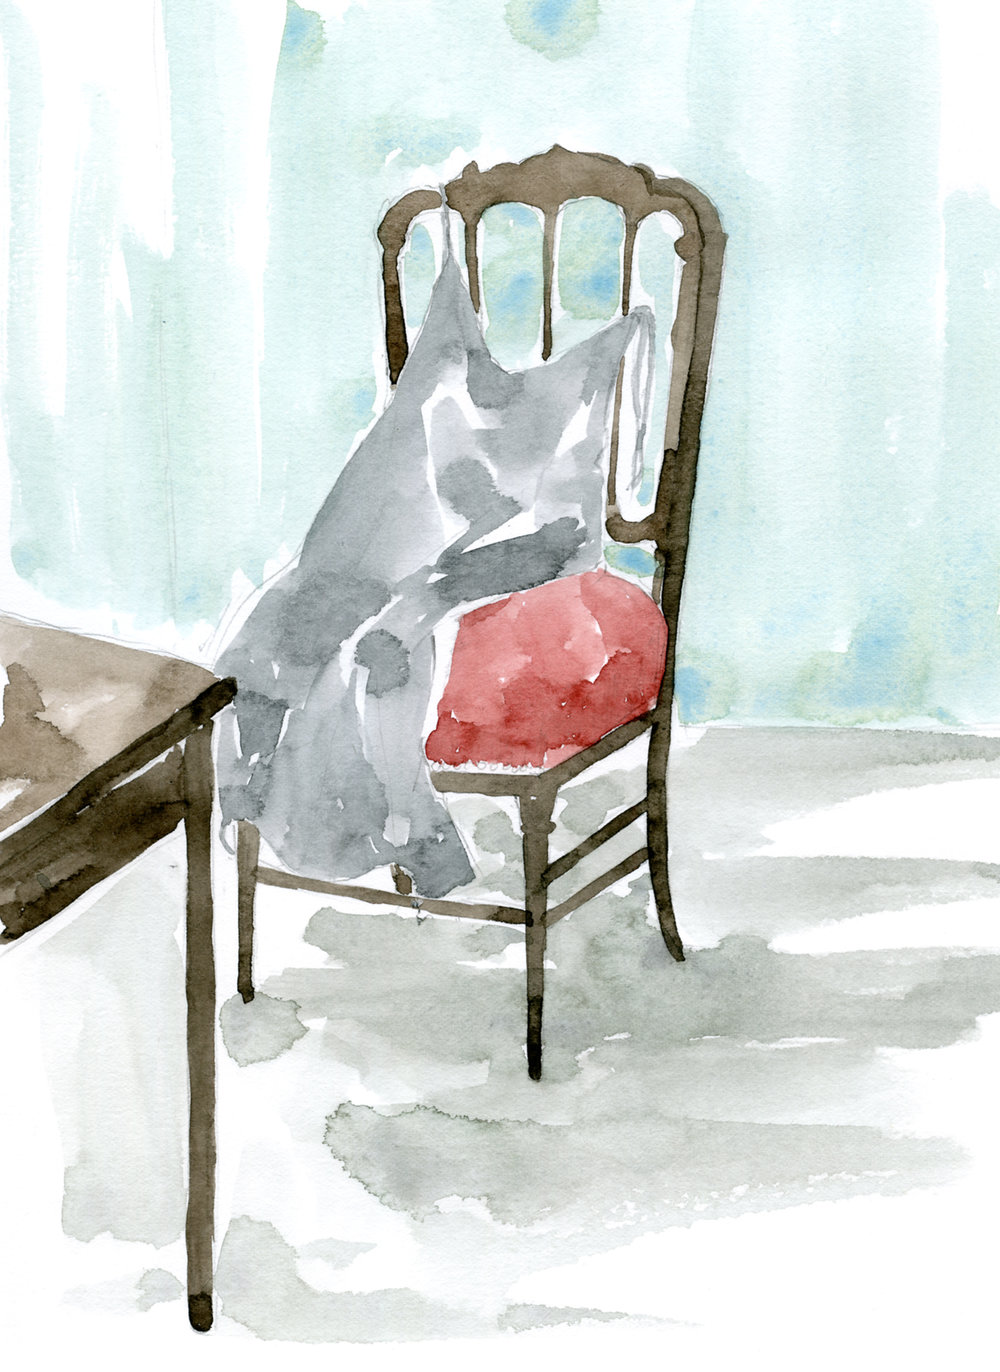 "Client Work for PEACH JOHN Web magazine ""momo Life"" Serialization「Lingerie in Cinema」 Column by Madoka Yamazaki Illustration and typography by Yuriko Oyama   From a book  A Wild Sheep Chase : Haruki Murakami    村上春樹「羊をめぐる冒険」 (1982)より。   Client Work for PEACH JOHN Web magazine ""momo Life"" Serialization「Lingerie in Cinema」 山崎まどかさんコラム イラストレーション:おおやまゆりこ 「The Royal Tenenbaums (2001)」イラストレーション"